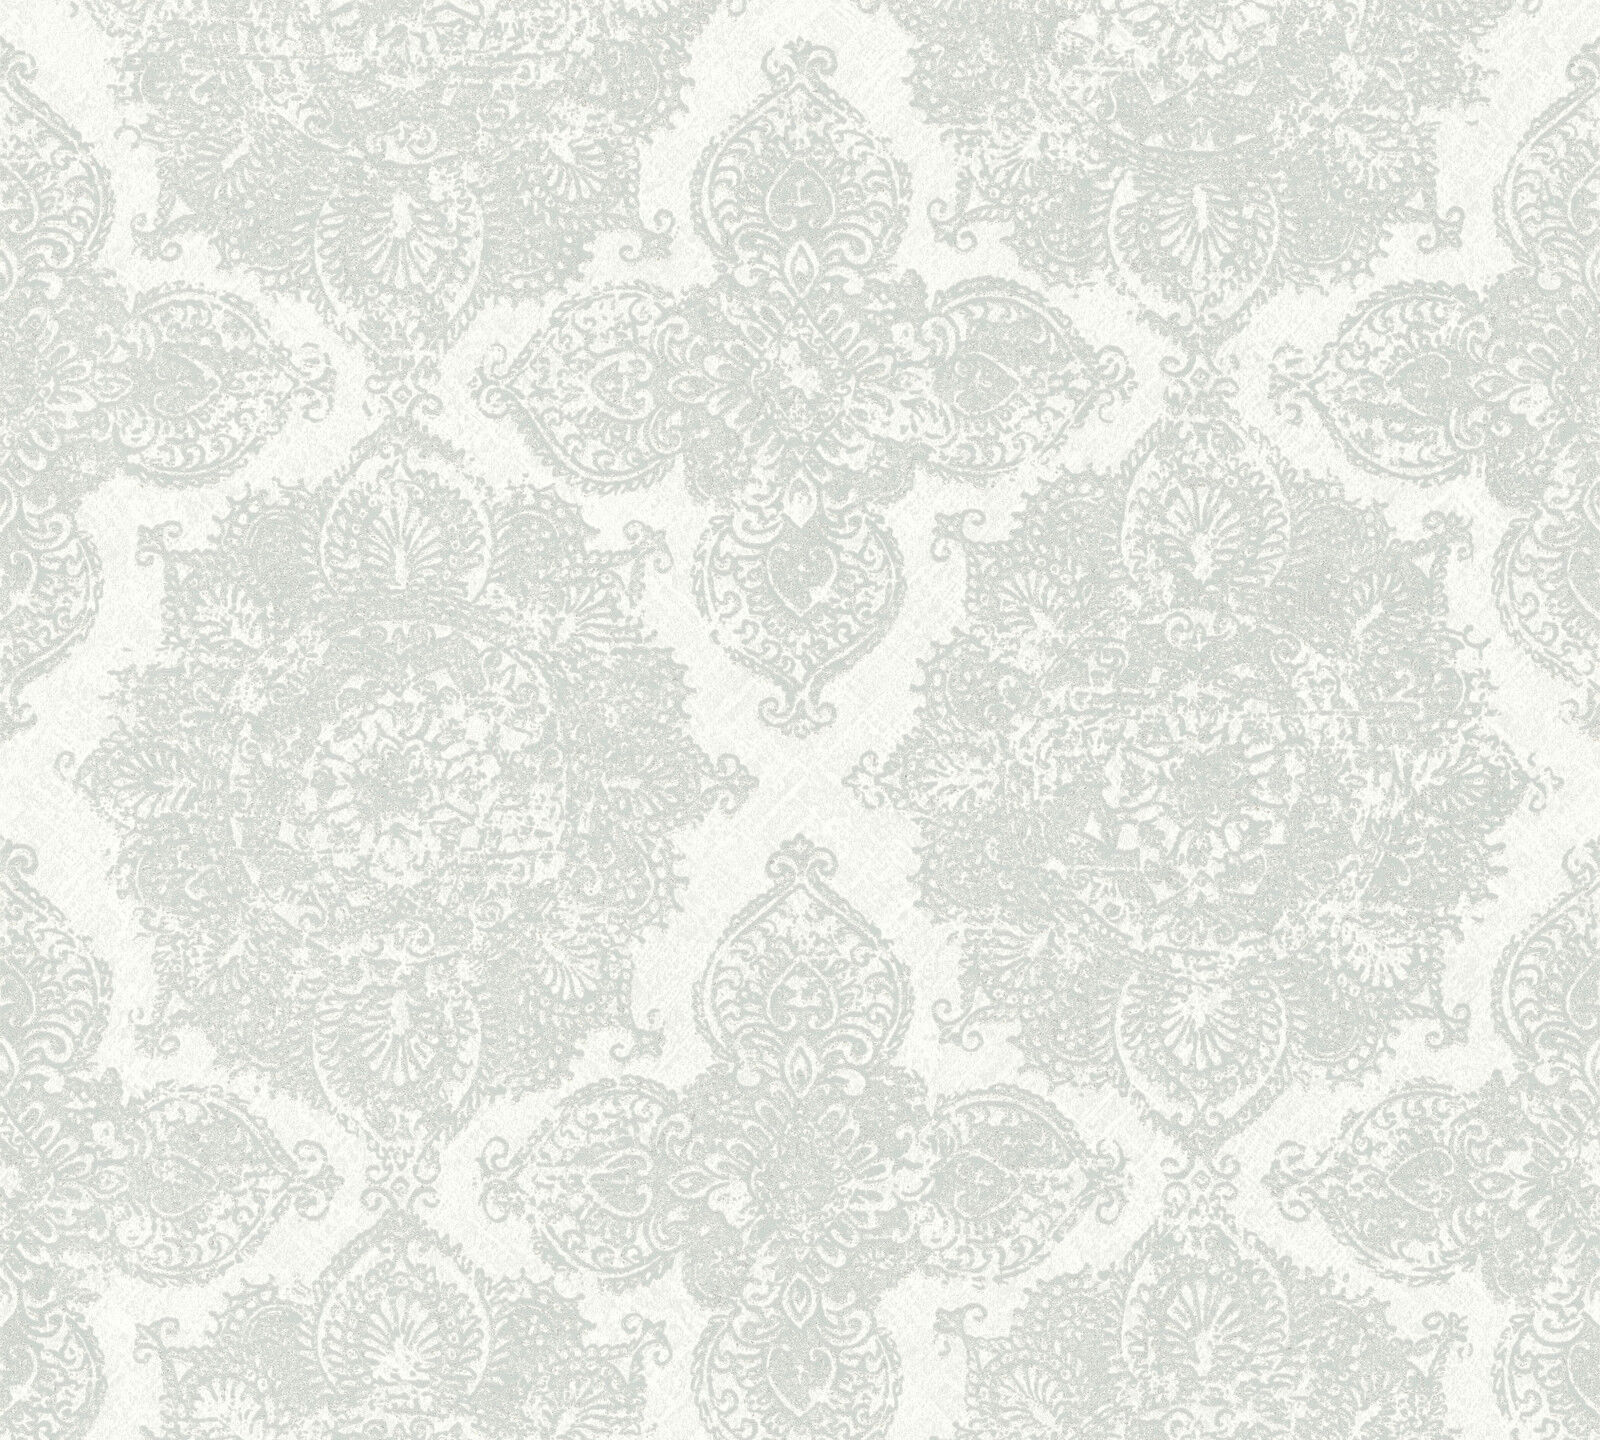 Boheme Ornament Vlies Tapete Grau Wei Silber Ethno Boho